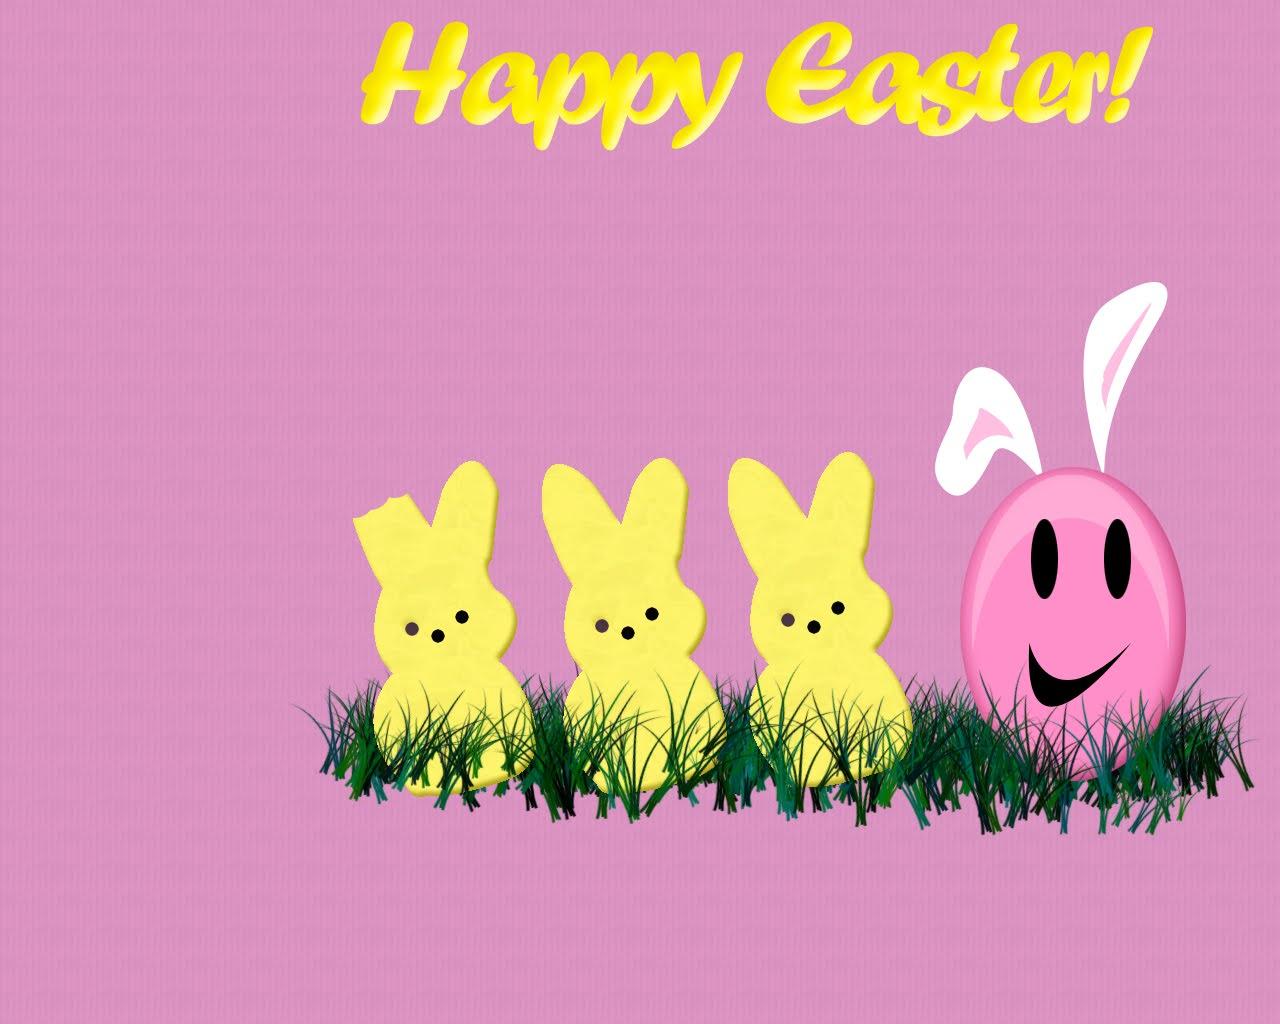 Funny Easter Wallpapers for Desktop